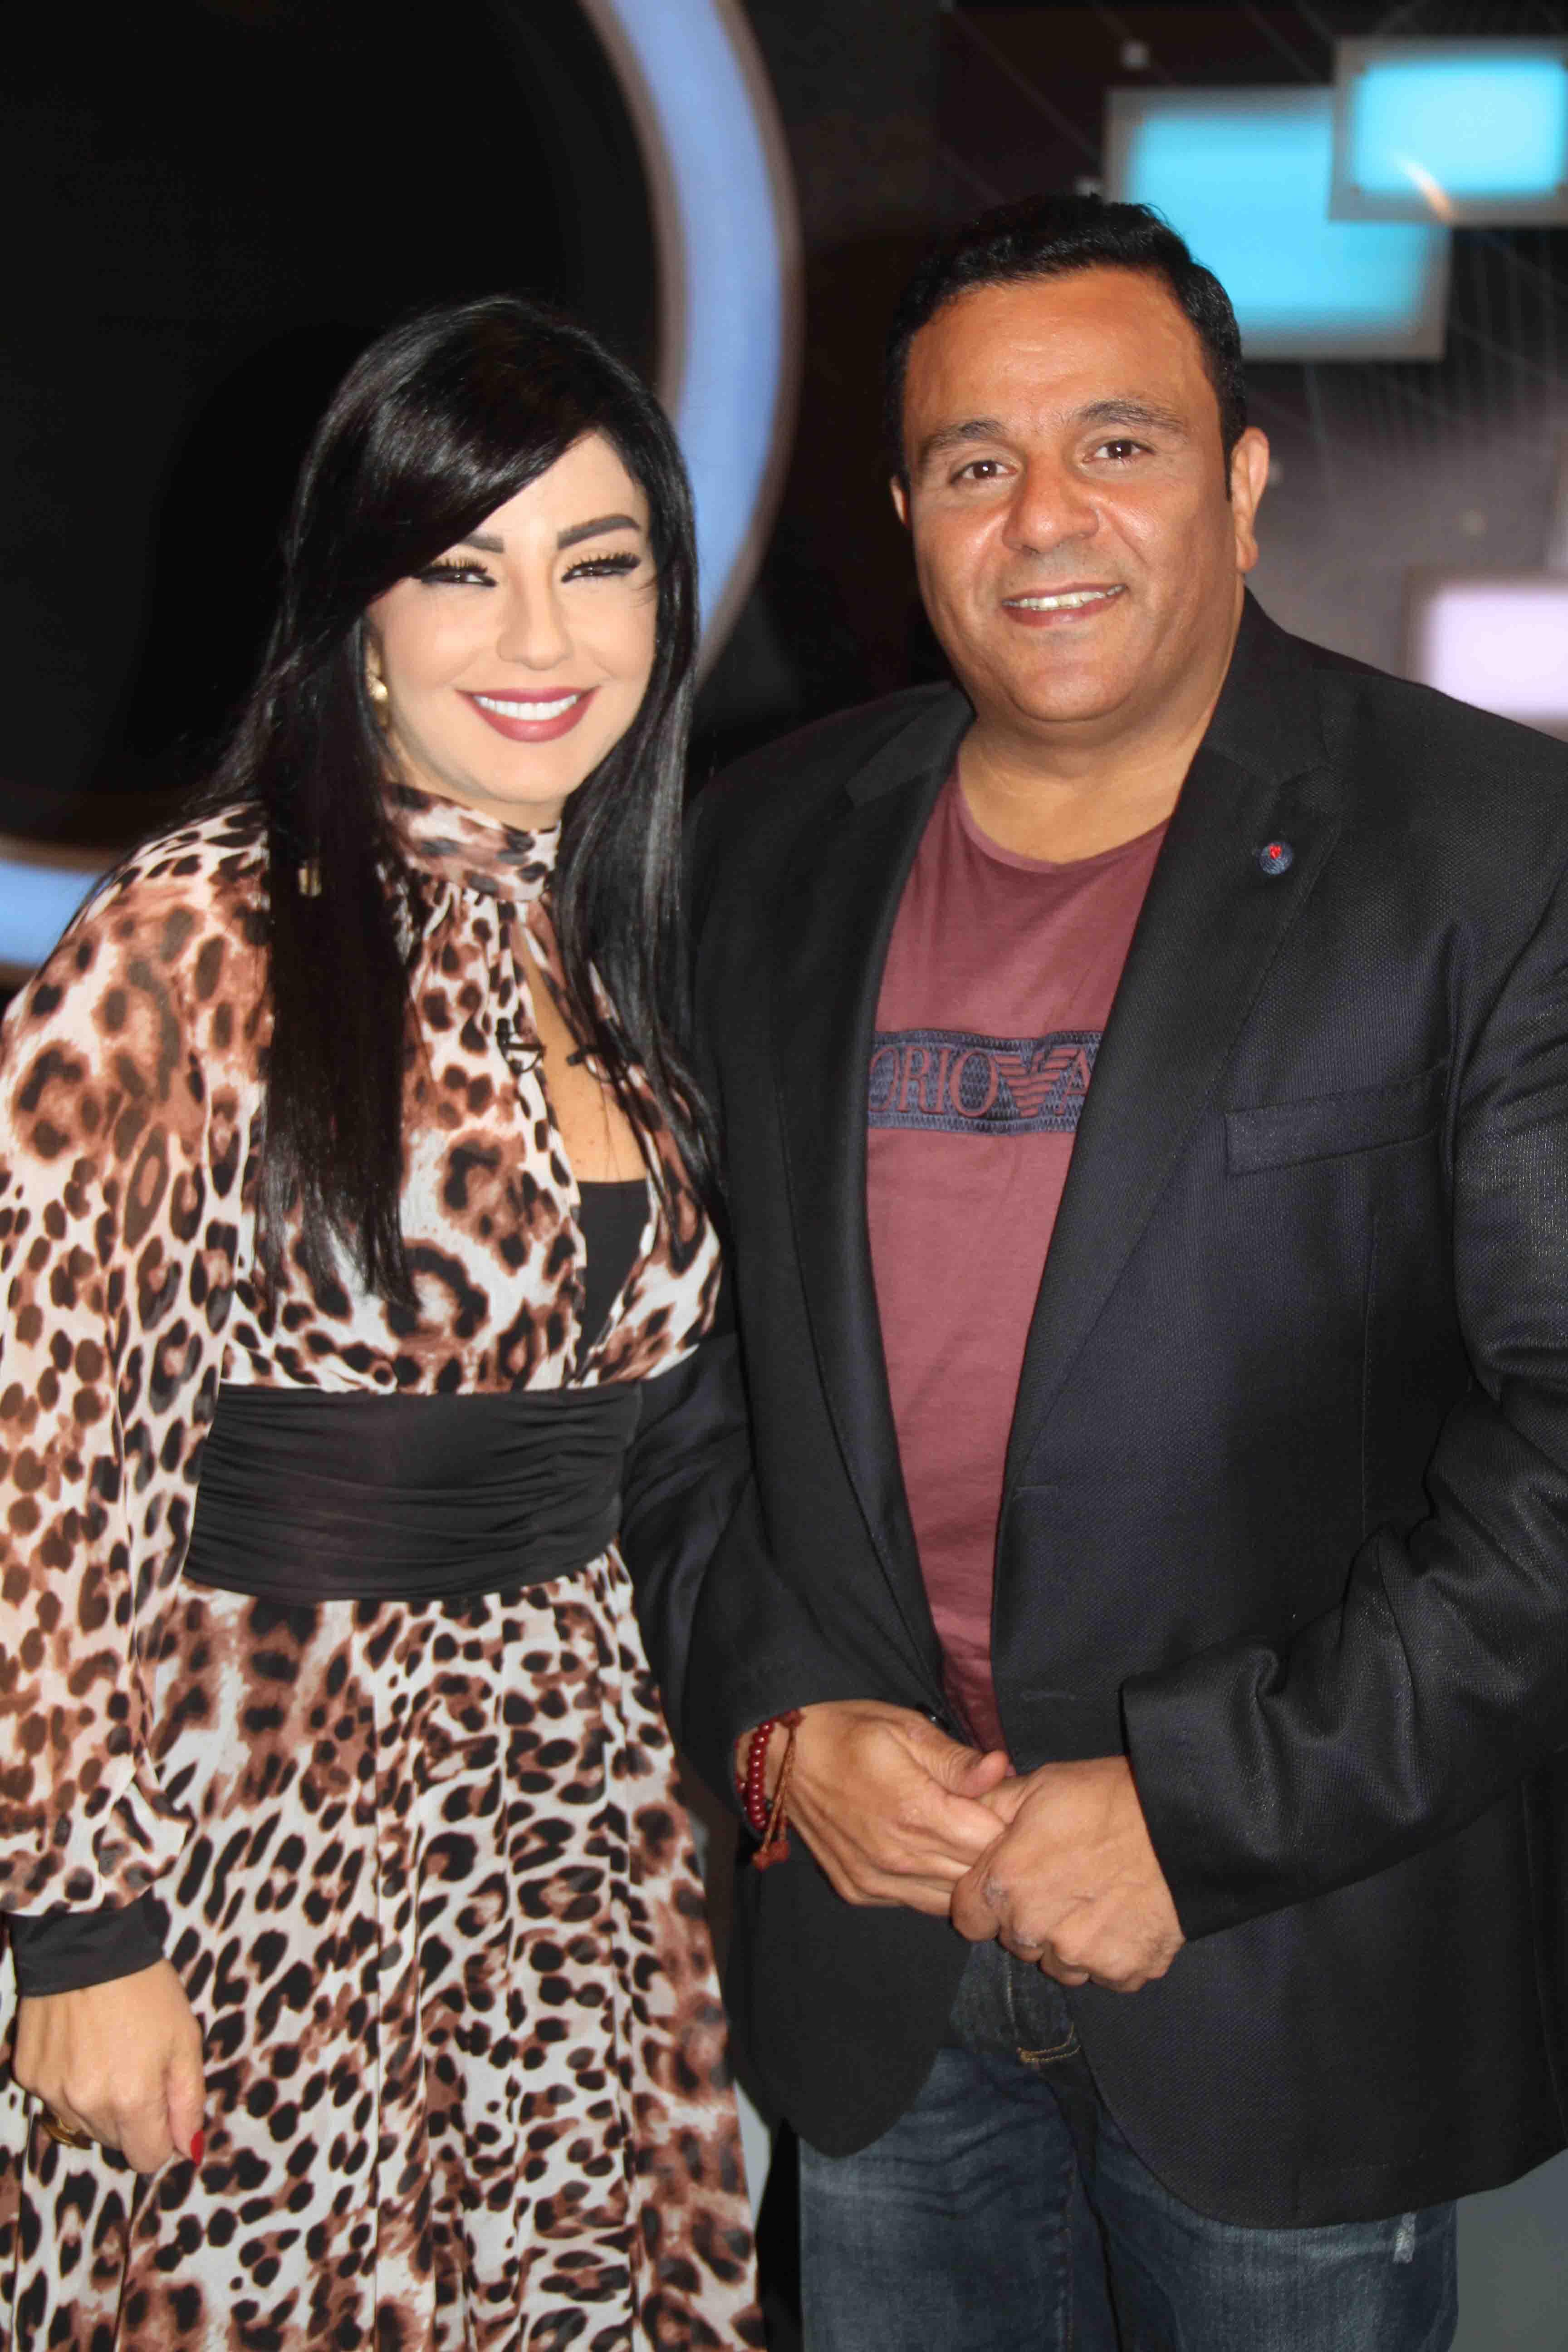 Music nation Mouhamad fouad 100 sou2al 3